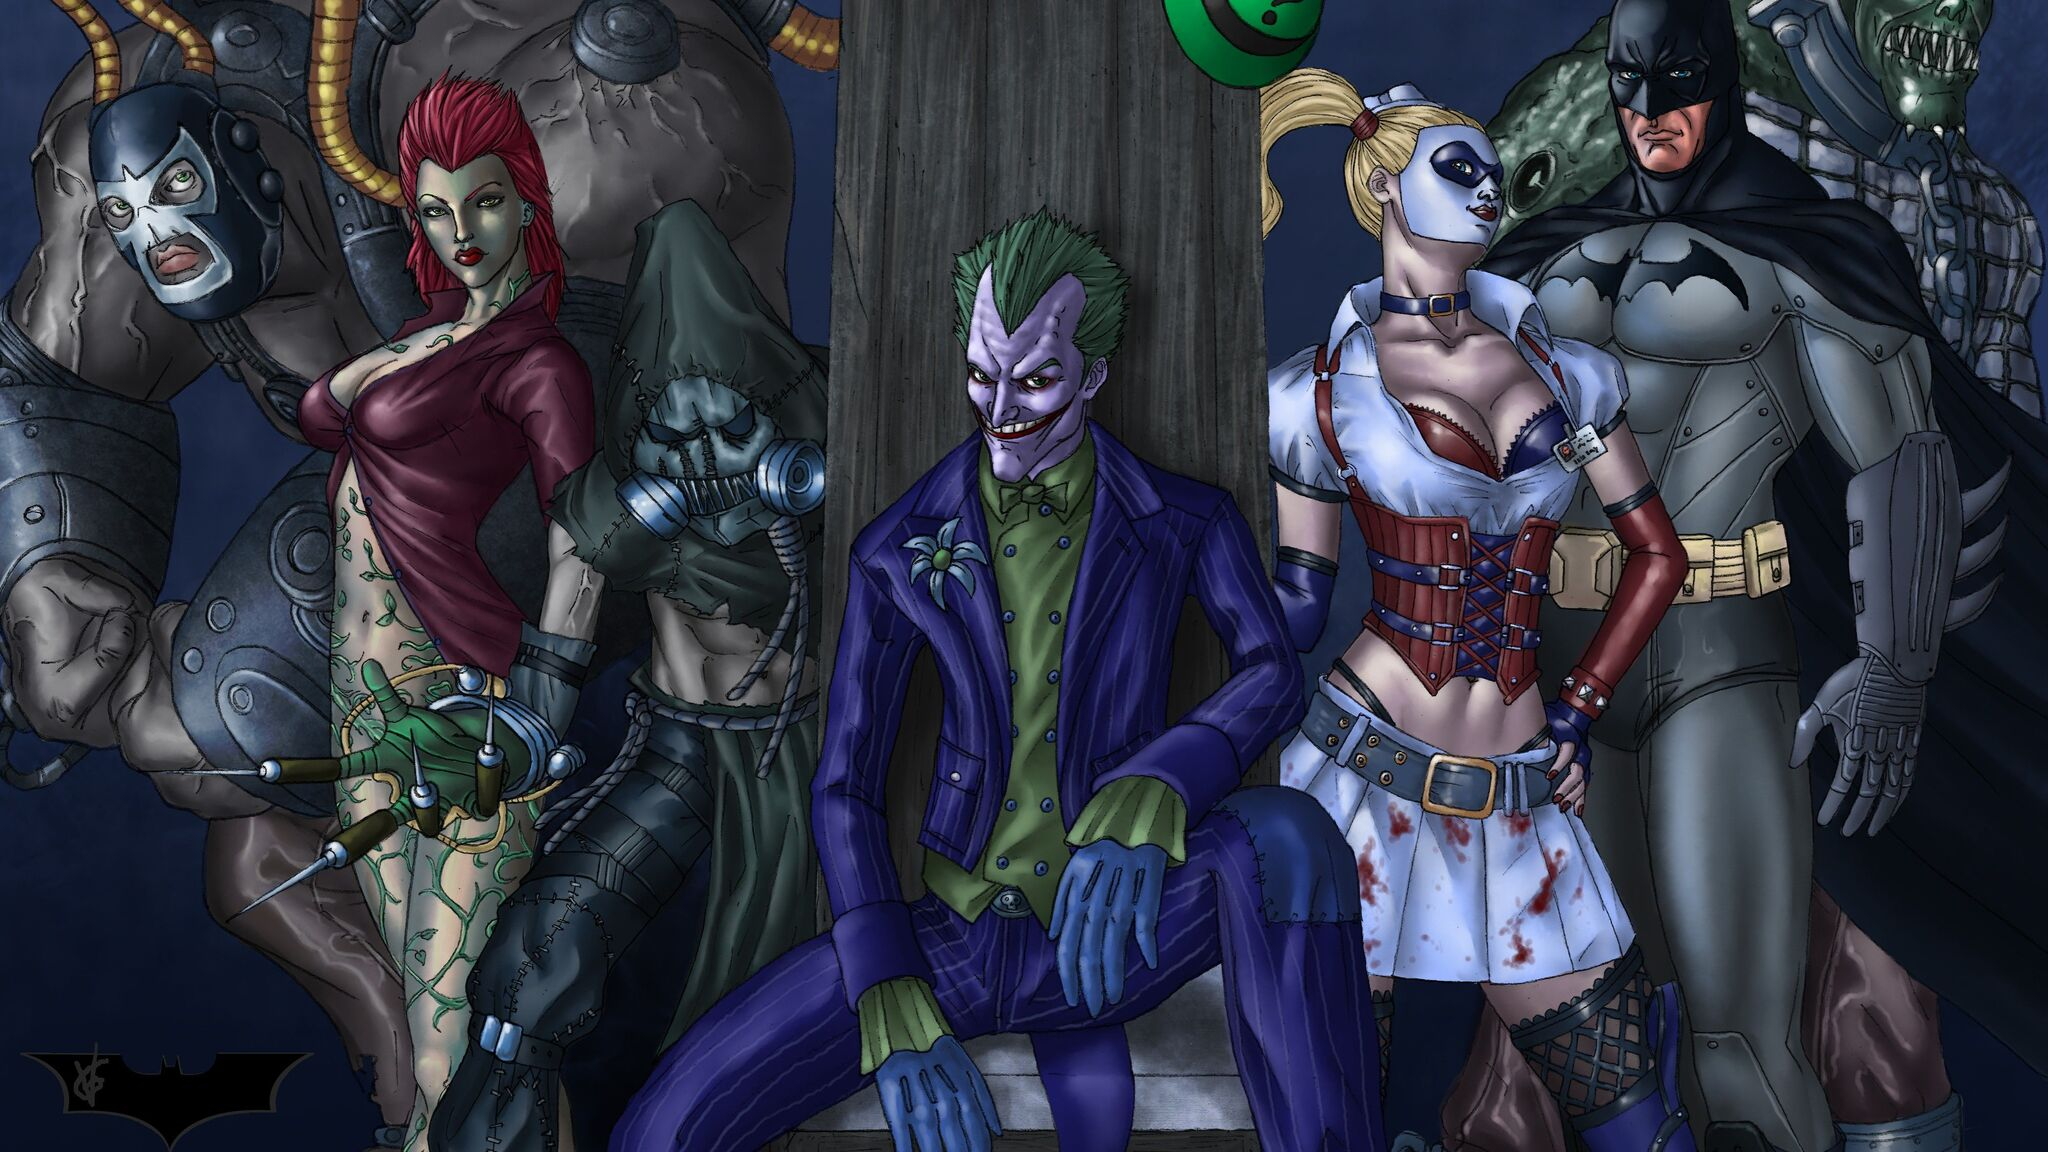 2048x1152 Art Batman Arkham Asylum 2048x1152 Resolution Hd